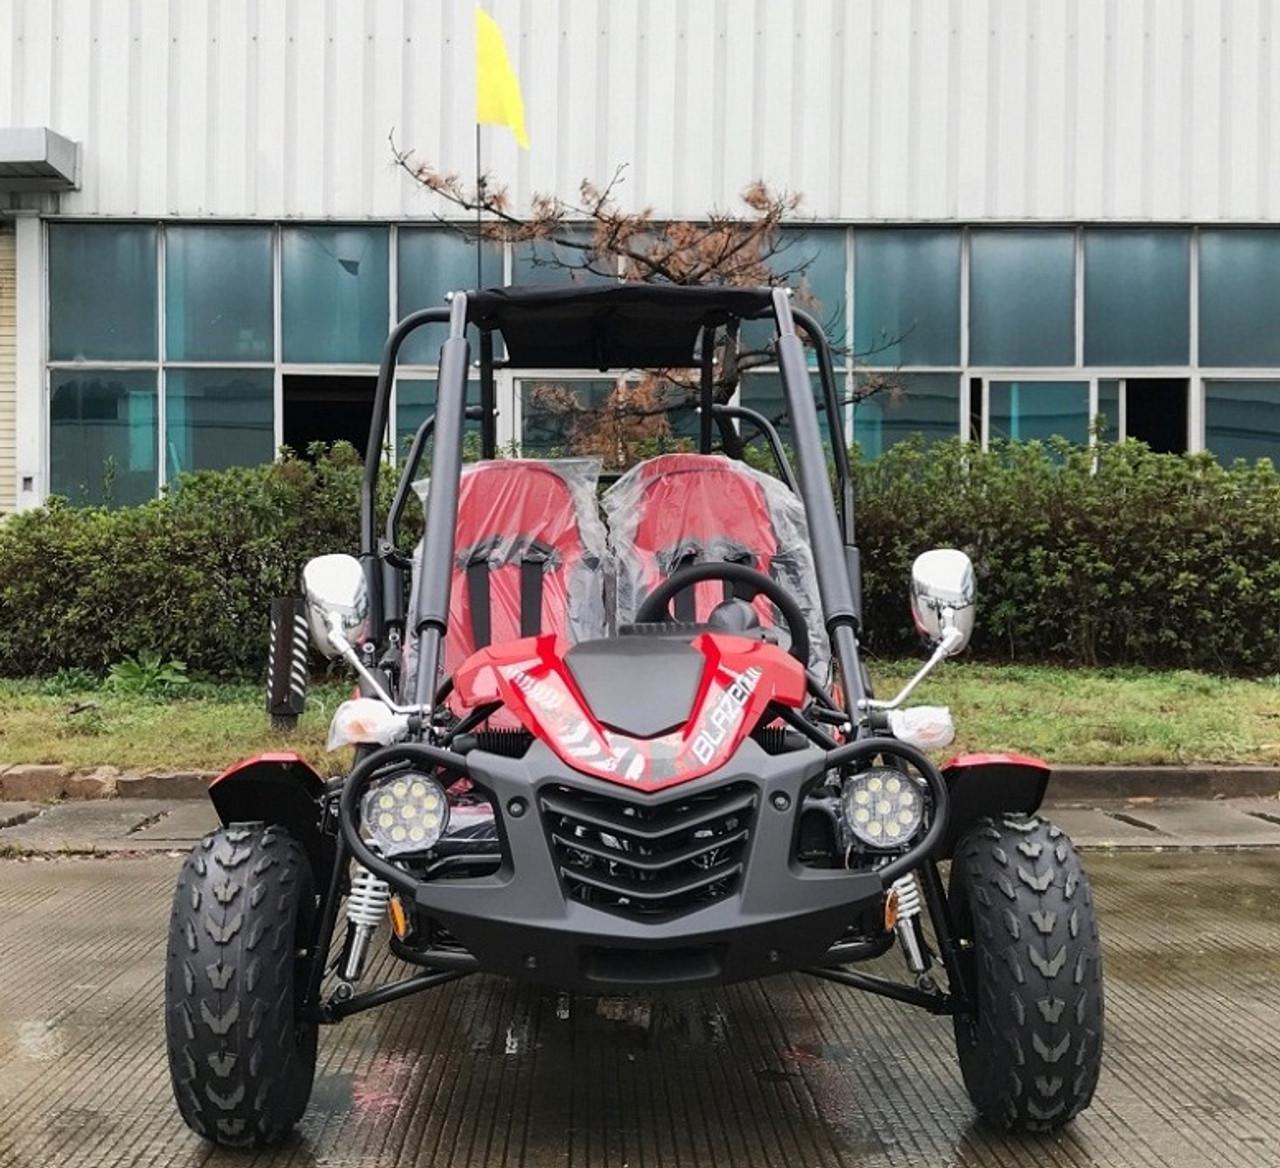 TrailMaster Blazer4 200EX, Air Cooled 4-Stroke, Single Cylinder Go Kart